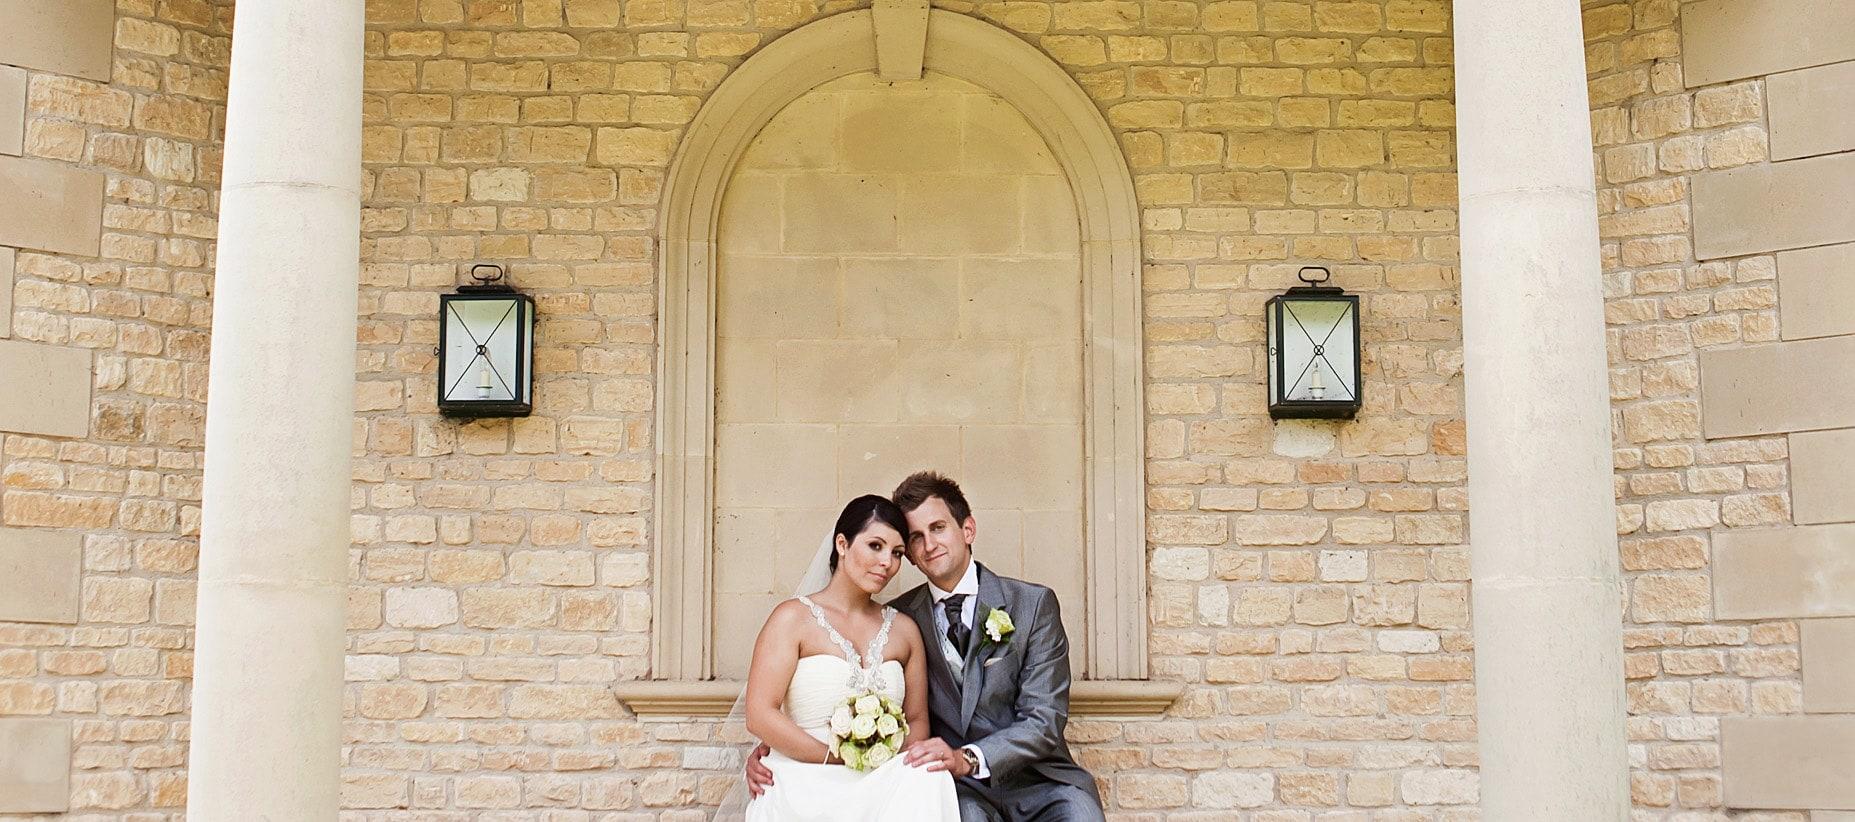 nottingham wedding photographer bride and groom